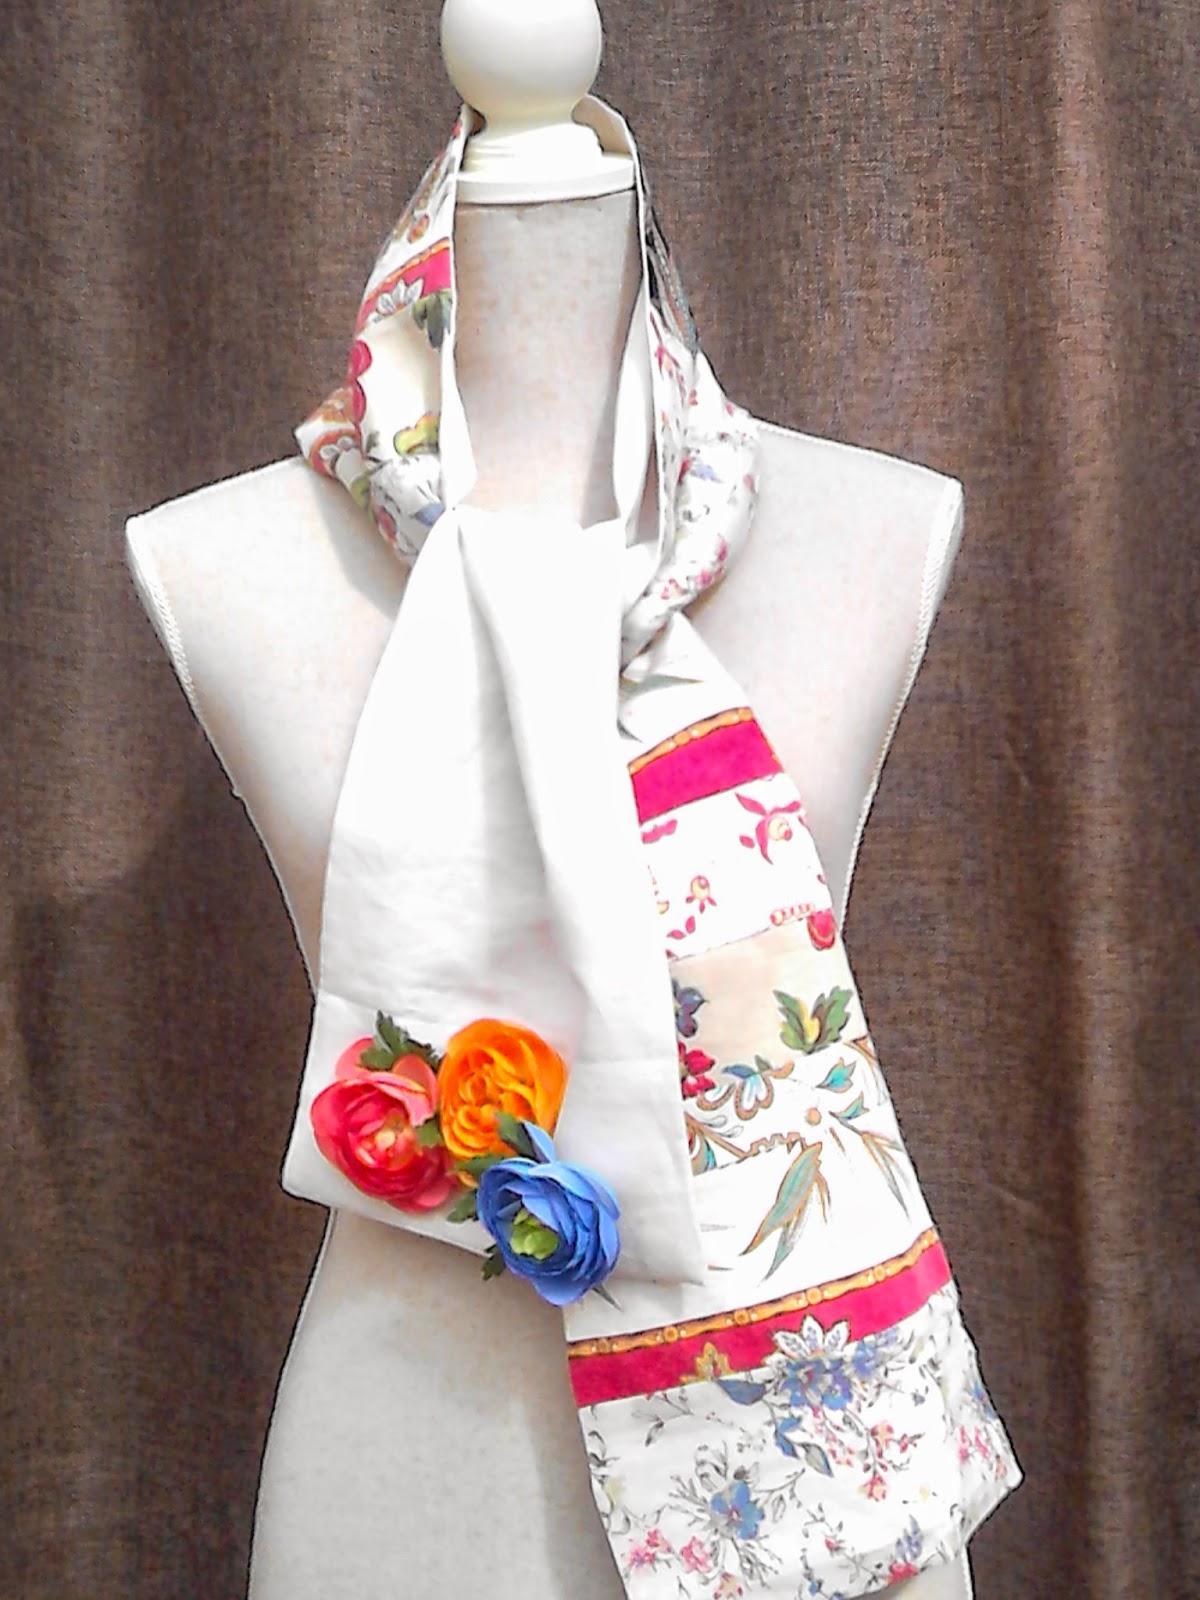 A ce joli foulard fleuri, une touche